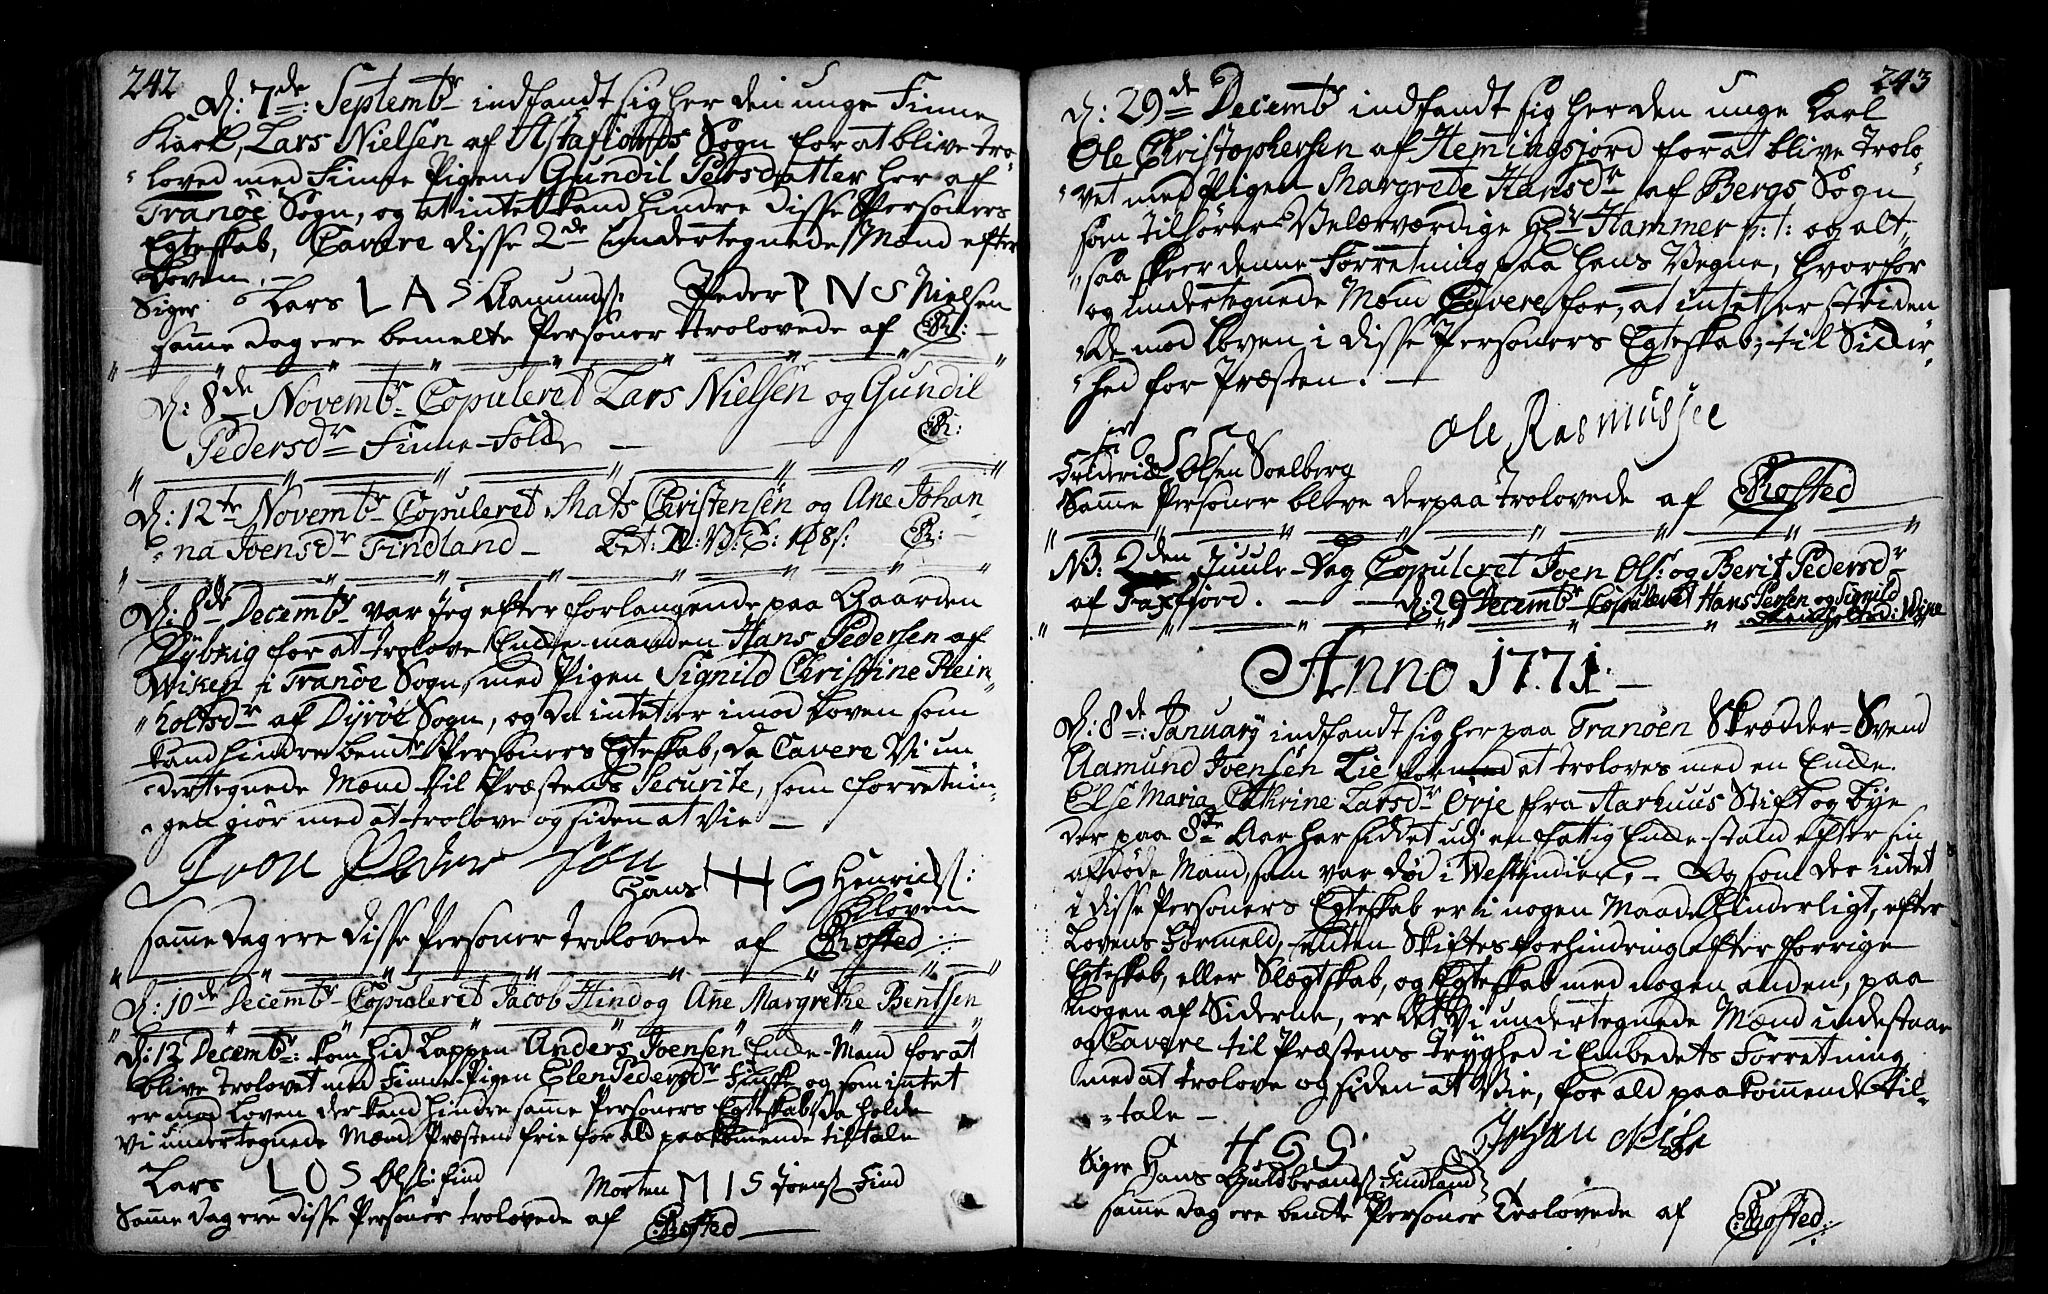 SATØ, Tranøy sokneprestkontor, I/Ia/Iaa/L0001kirke: Ministerialbok nr. 1, 1757-1773, s. 242-243